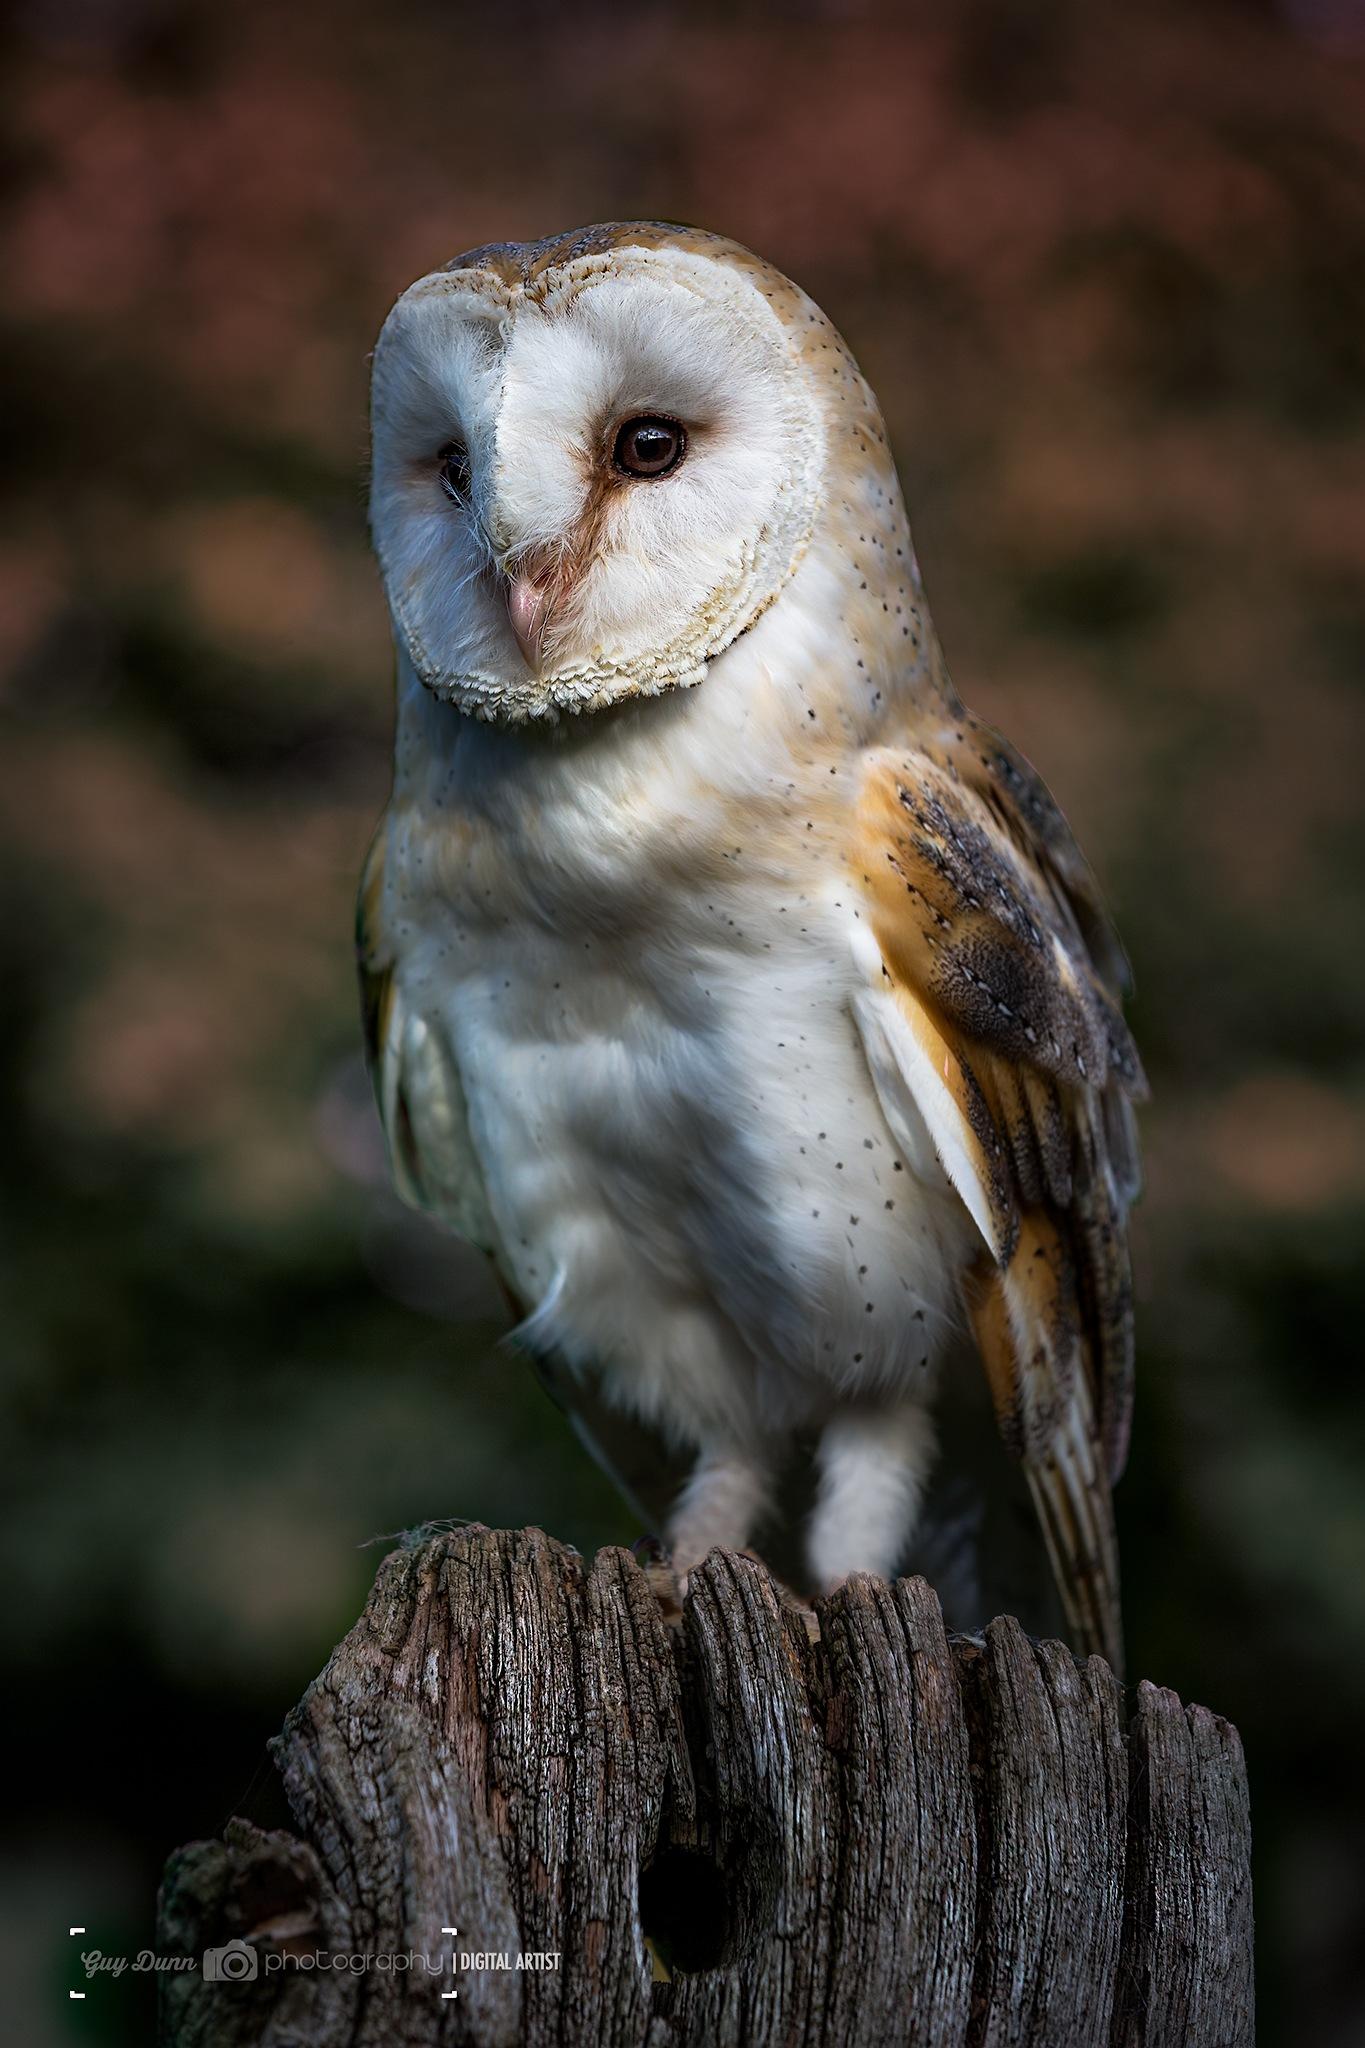 Barn Owl Portrait by Guy Dunn